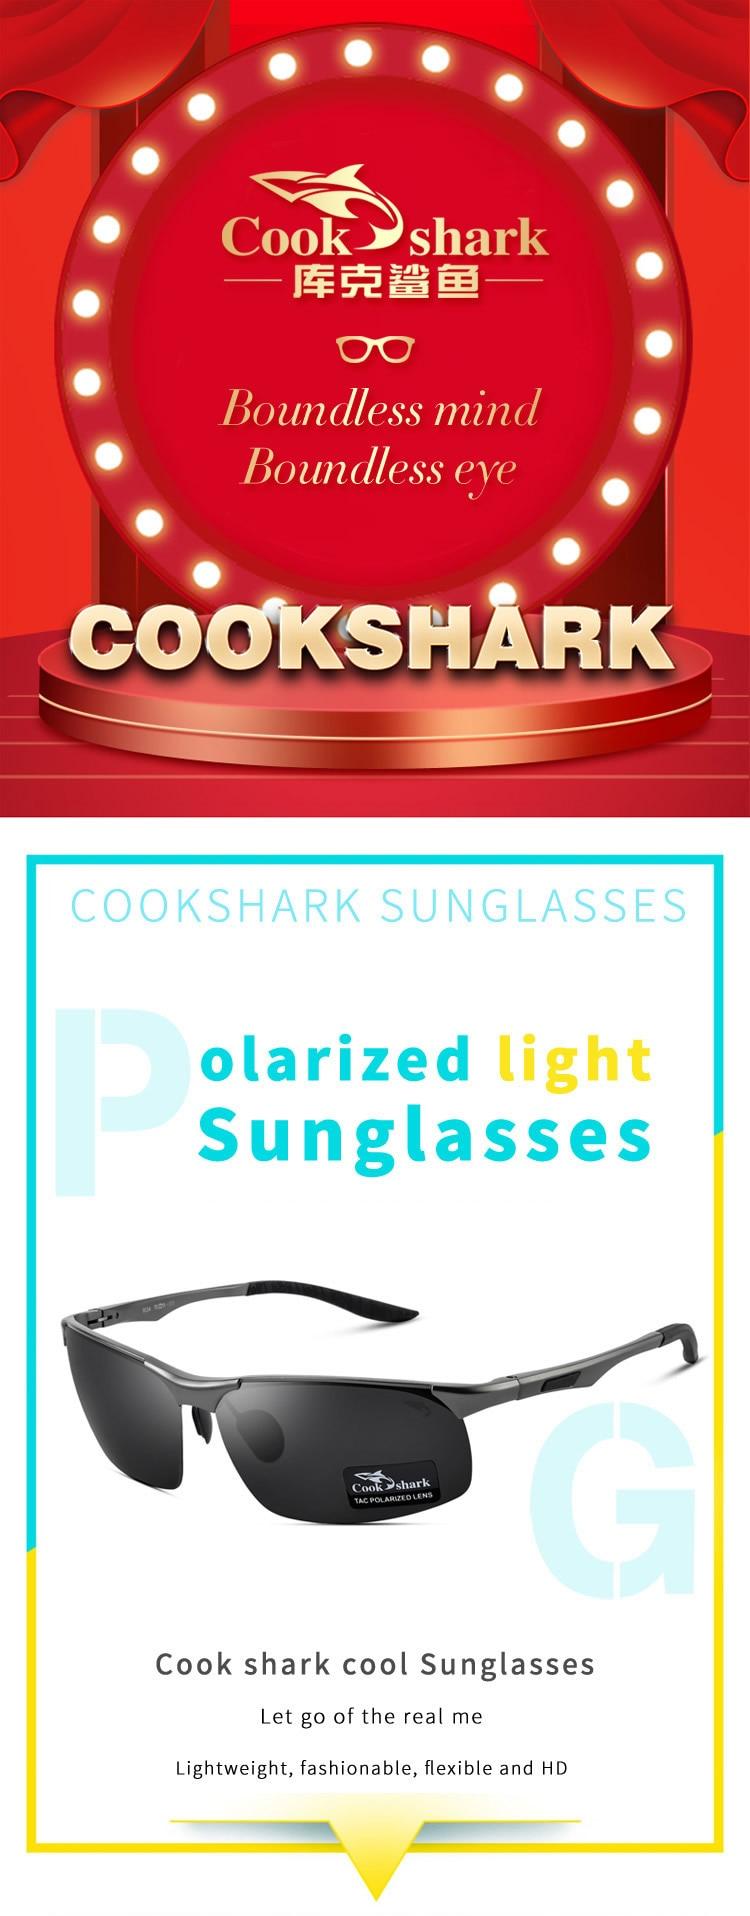 ochelari de soare cook shark